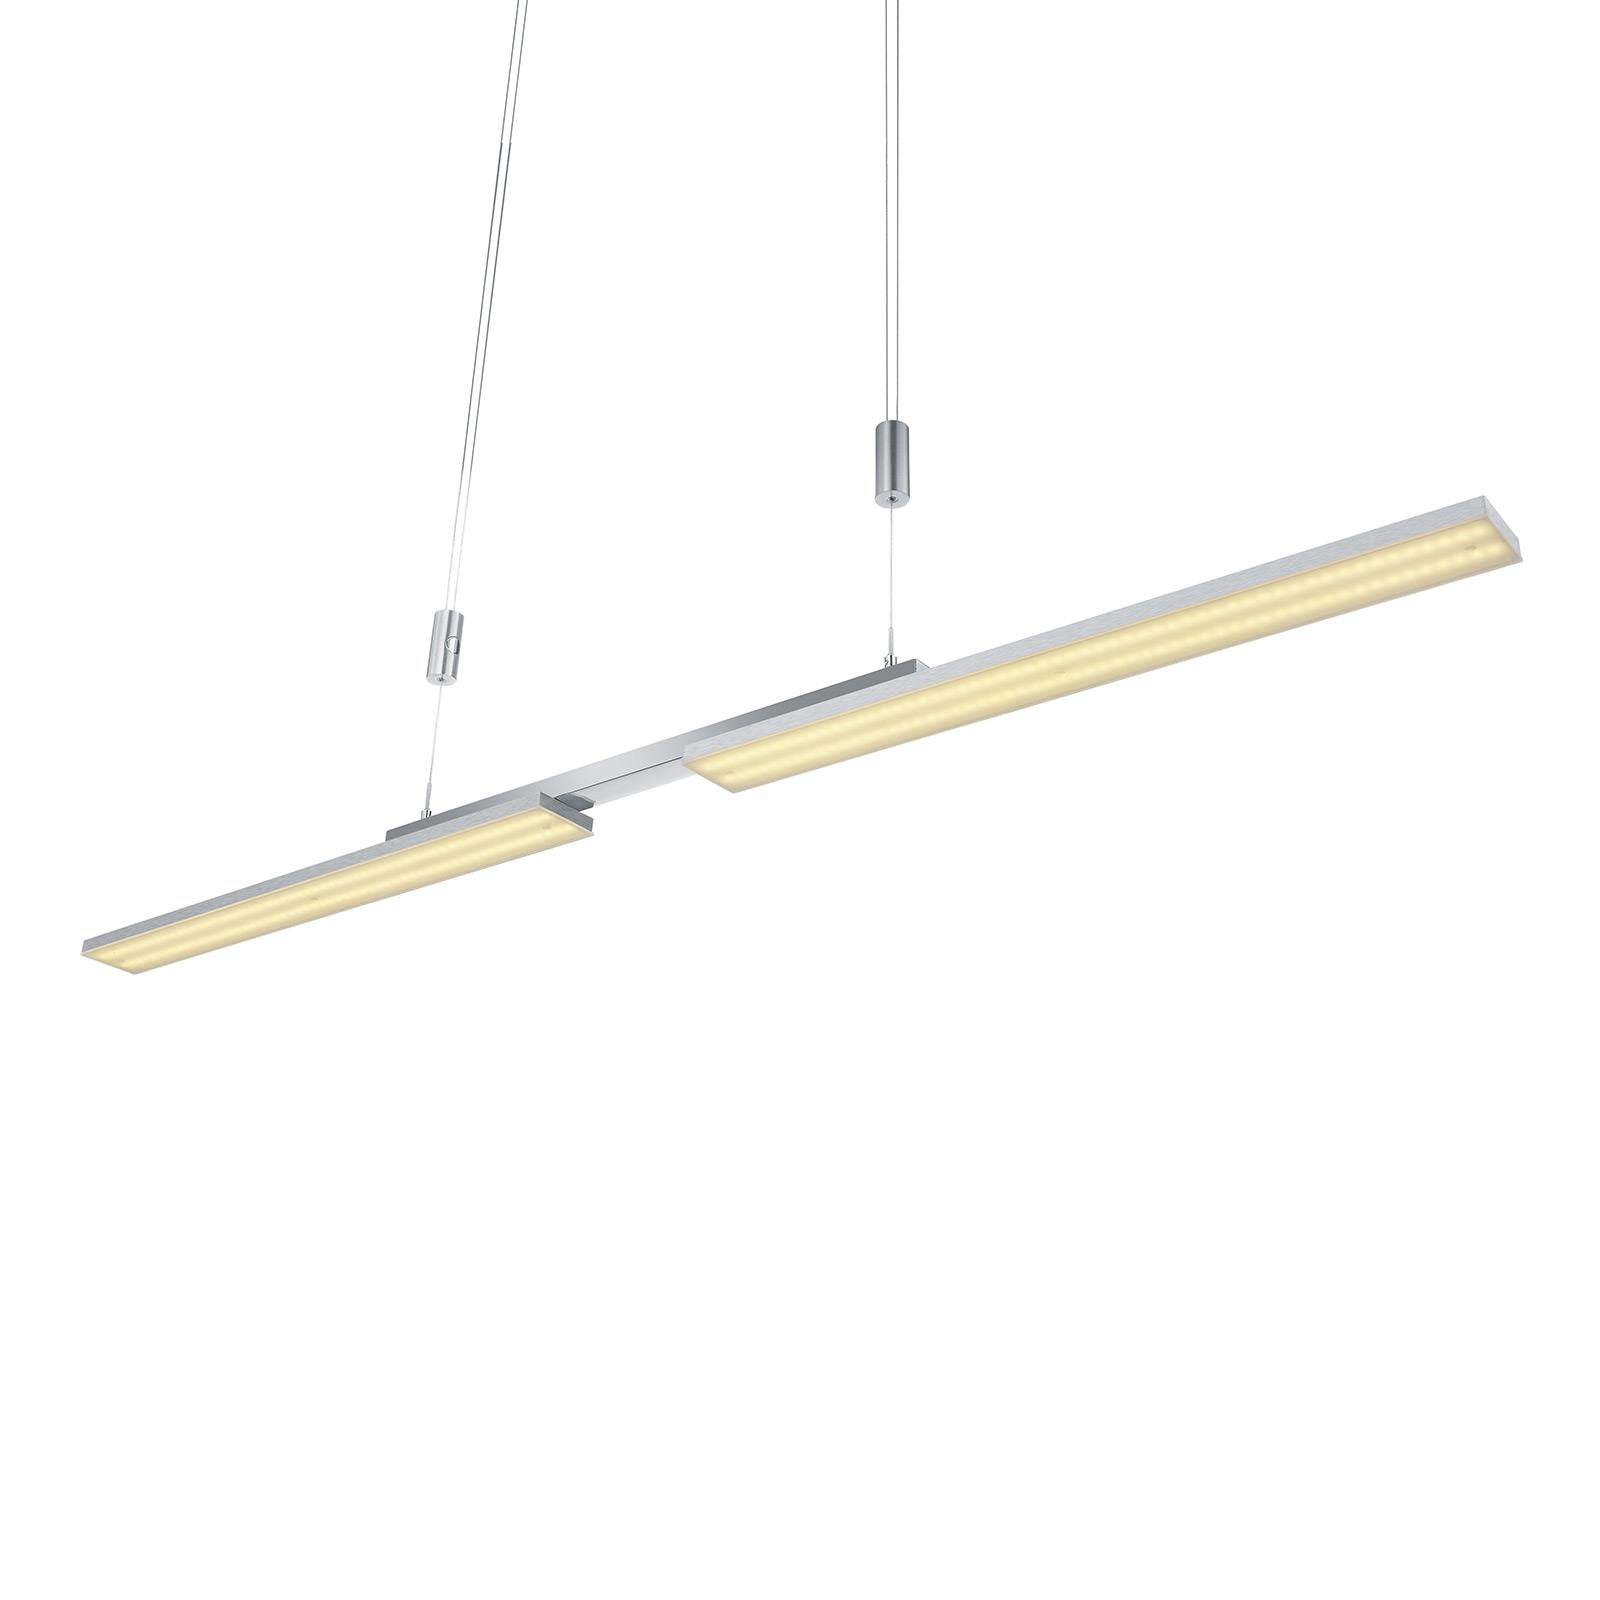 B-Leuchten Less lampa wisząca LED, nikiel matowy